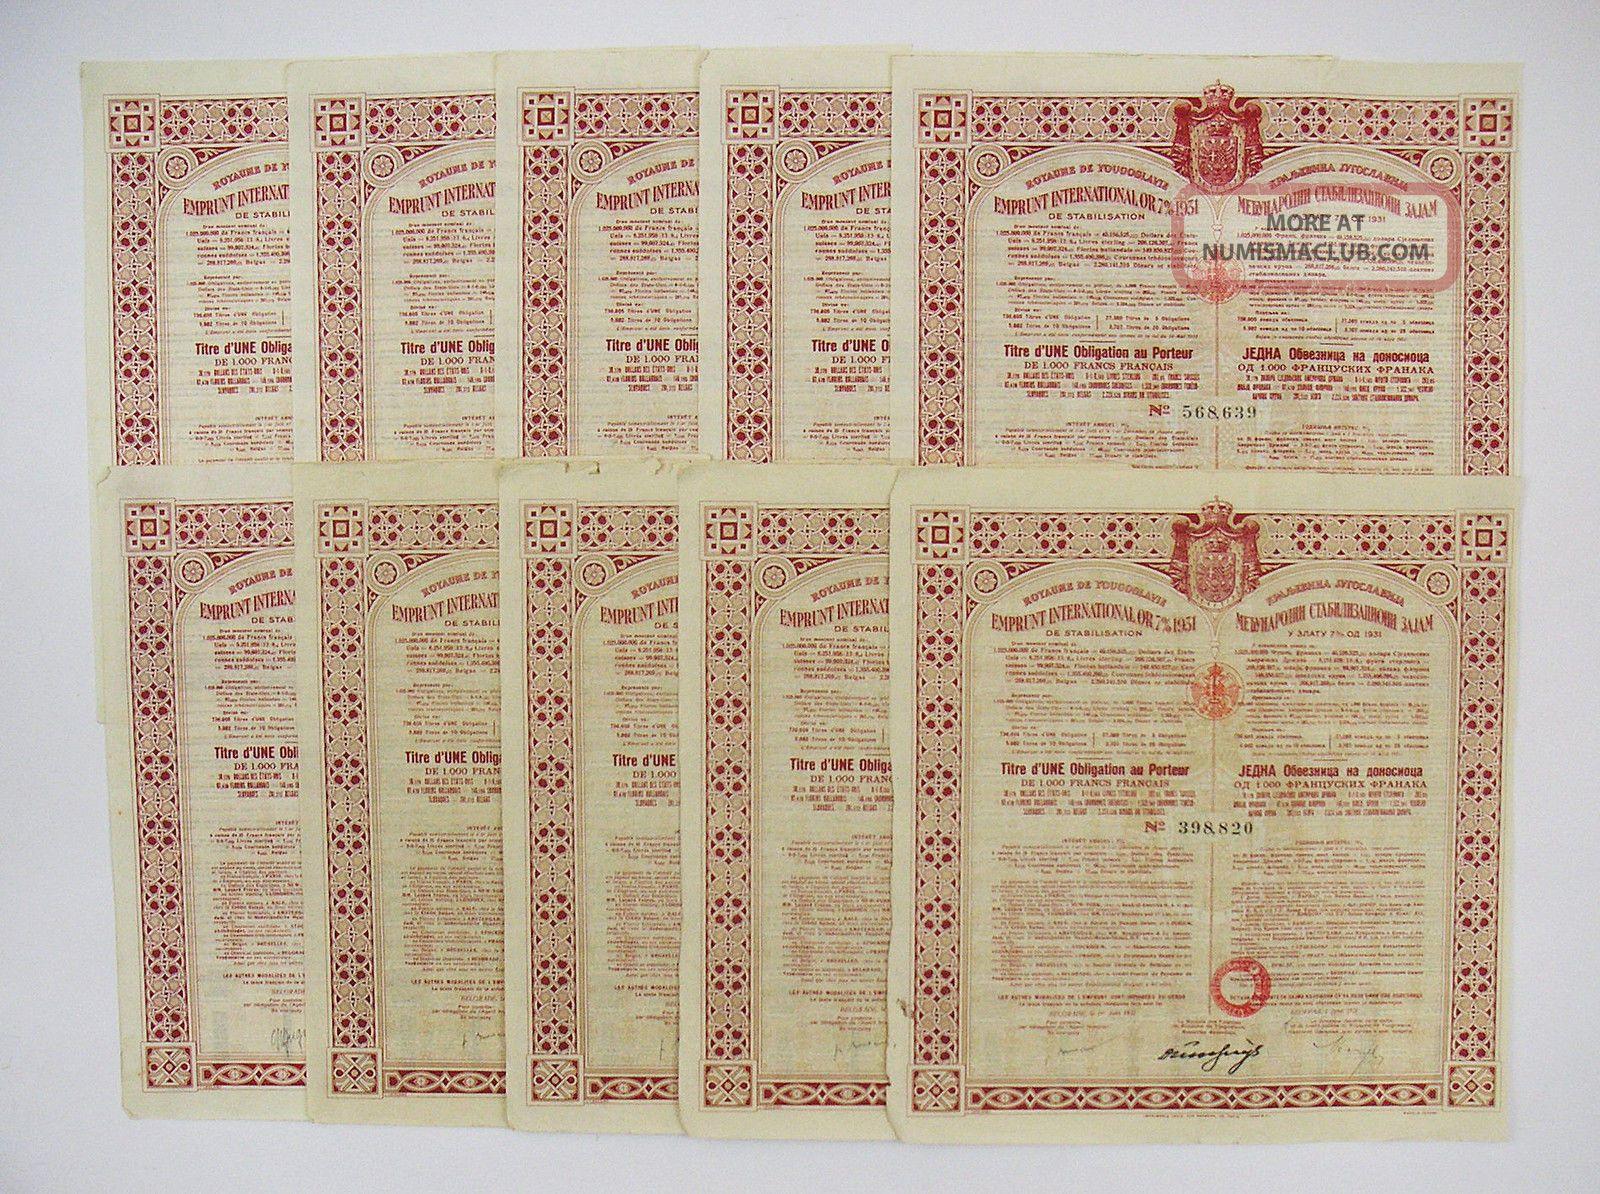 Emprunt International Or 7 1000f 1931 – Royaume De Yougoslavie (x10) Stocks & Bonds, Scripophily photo